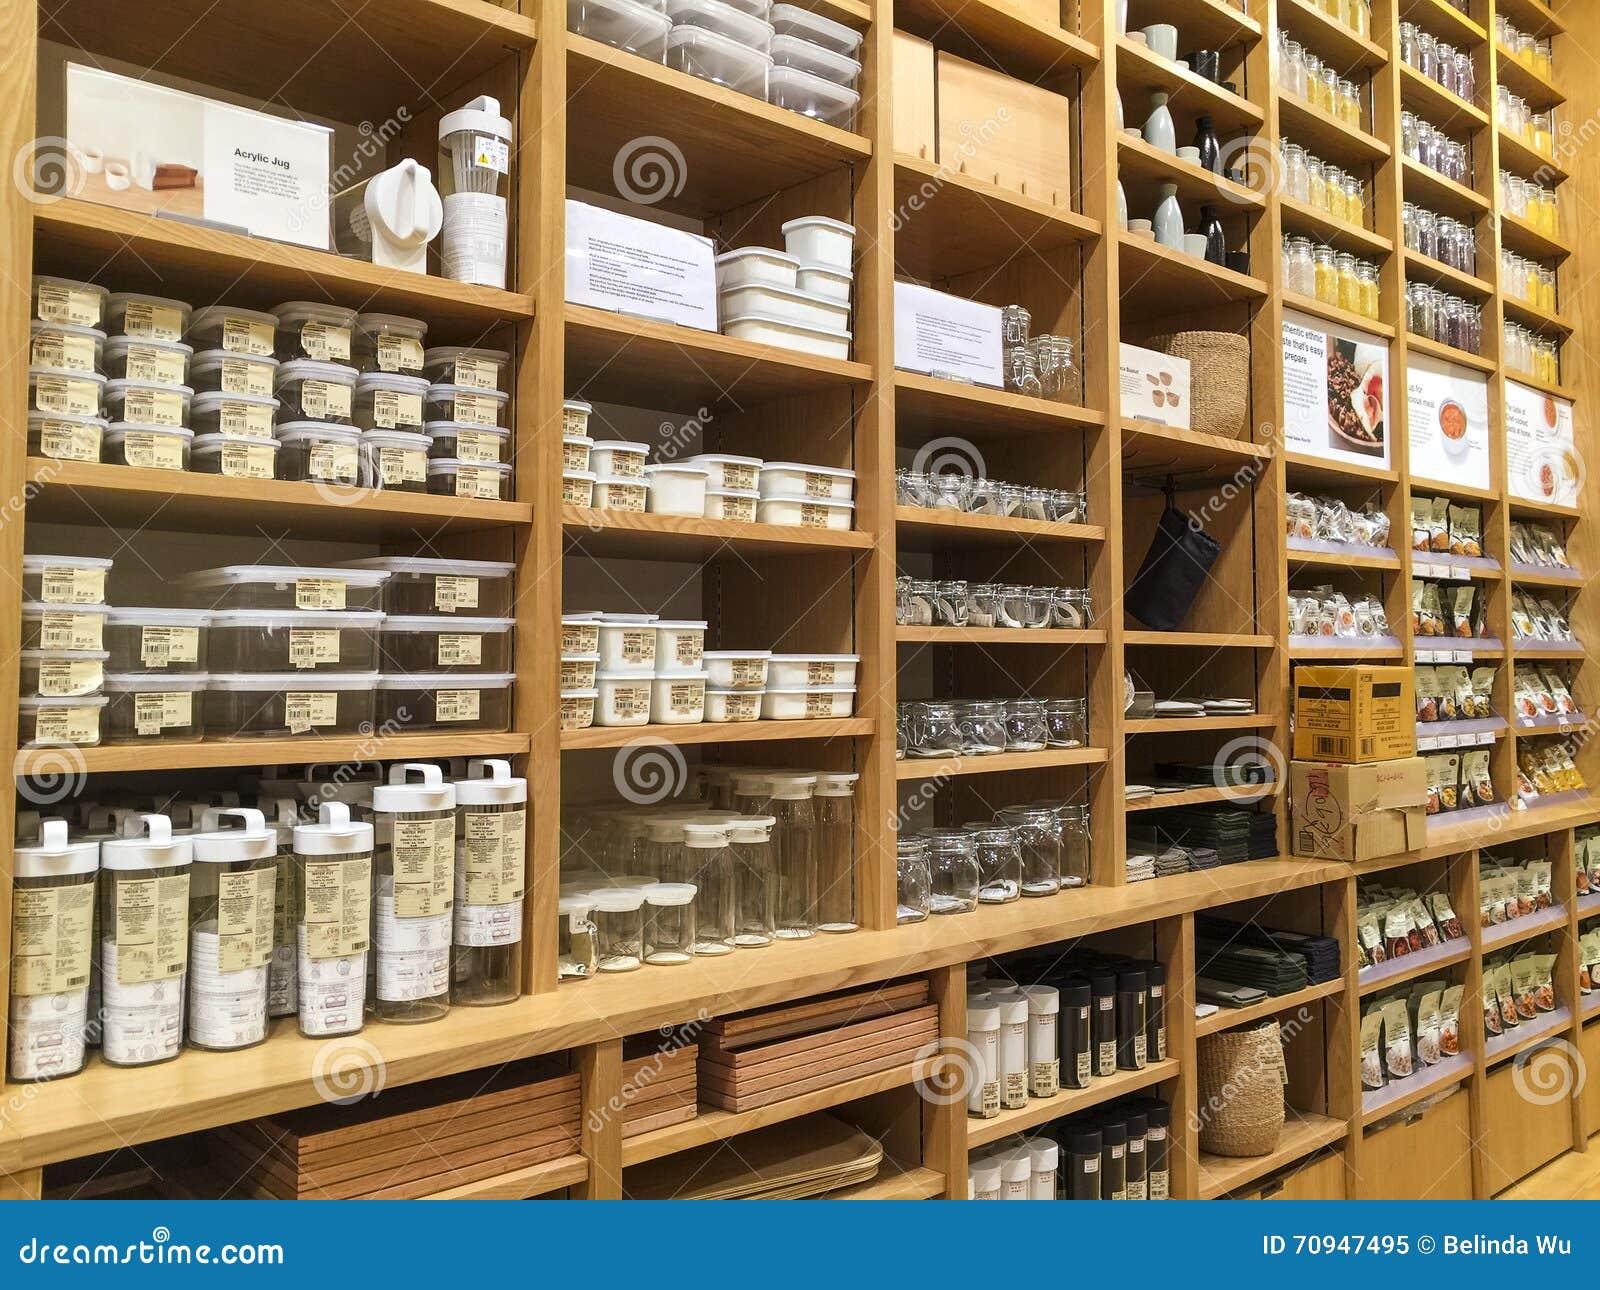 Kitchenware stock image. Image of food, shelves, kitchen ...